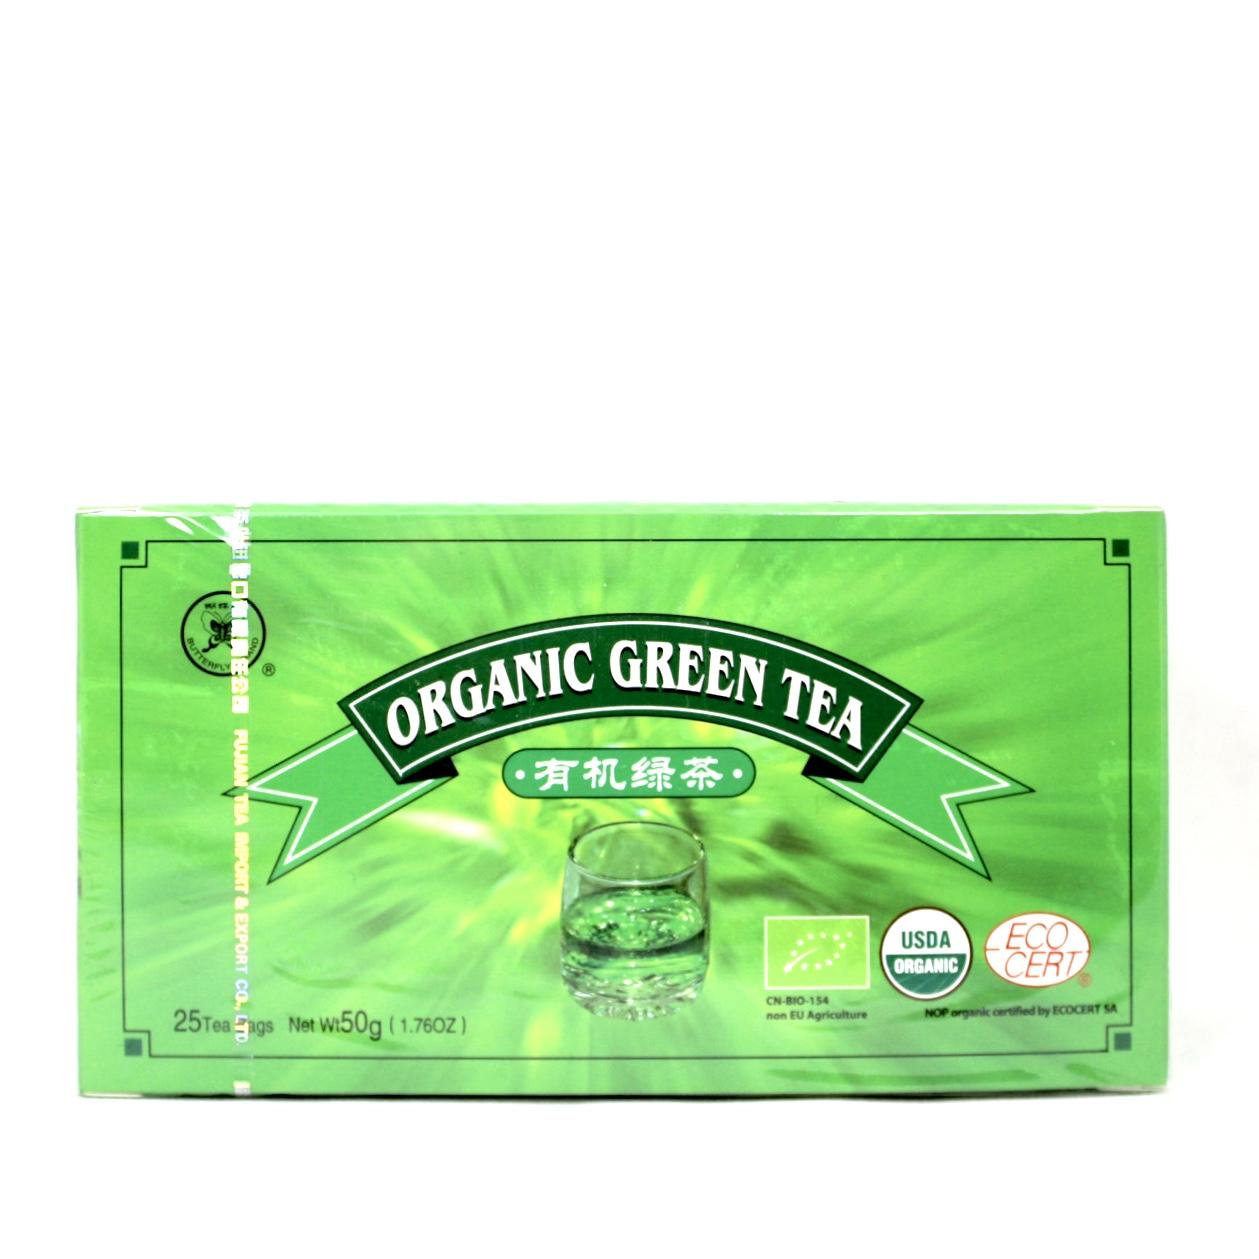 FUJIAN GREEN TEA 2g X 25 SACHET GT707 (VENCIMENTO 31/10/2021)